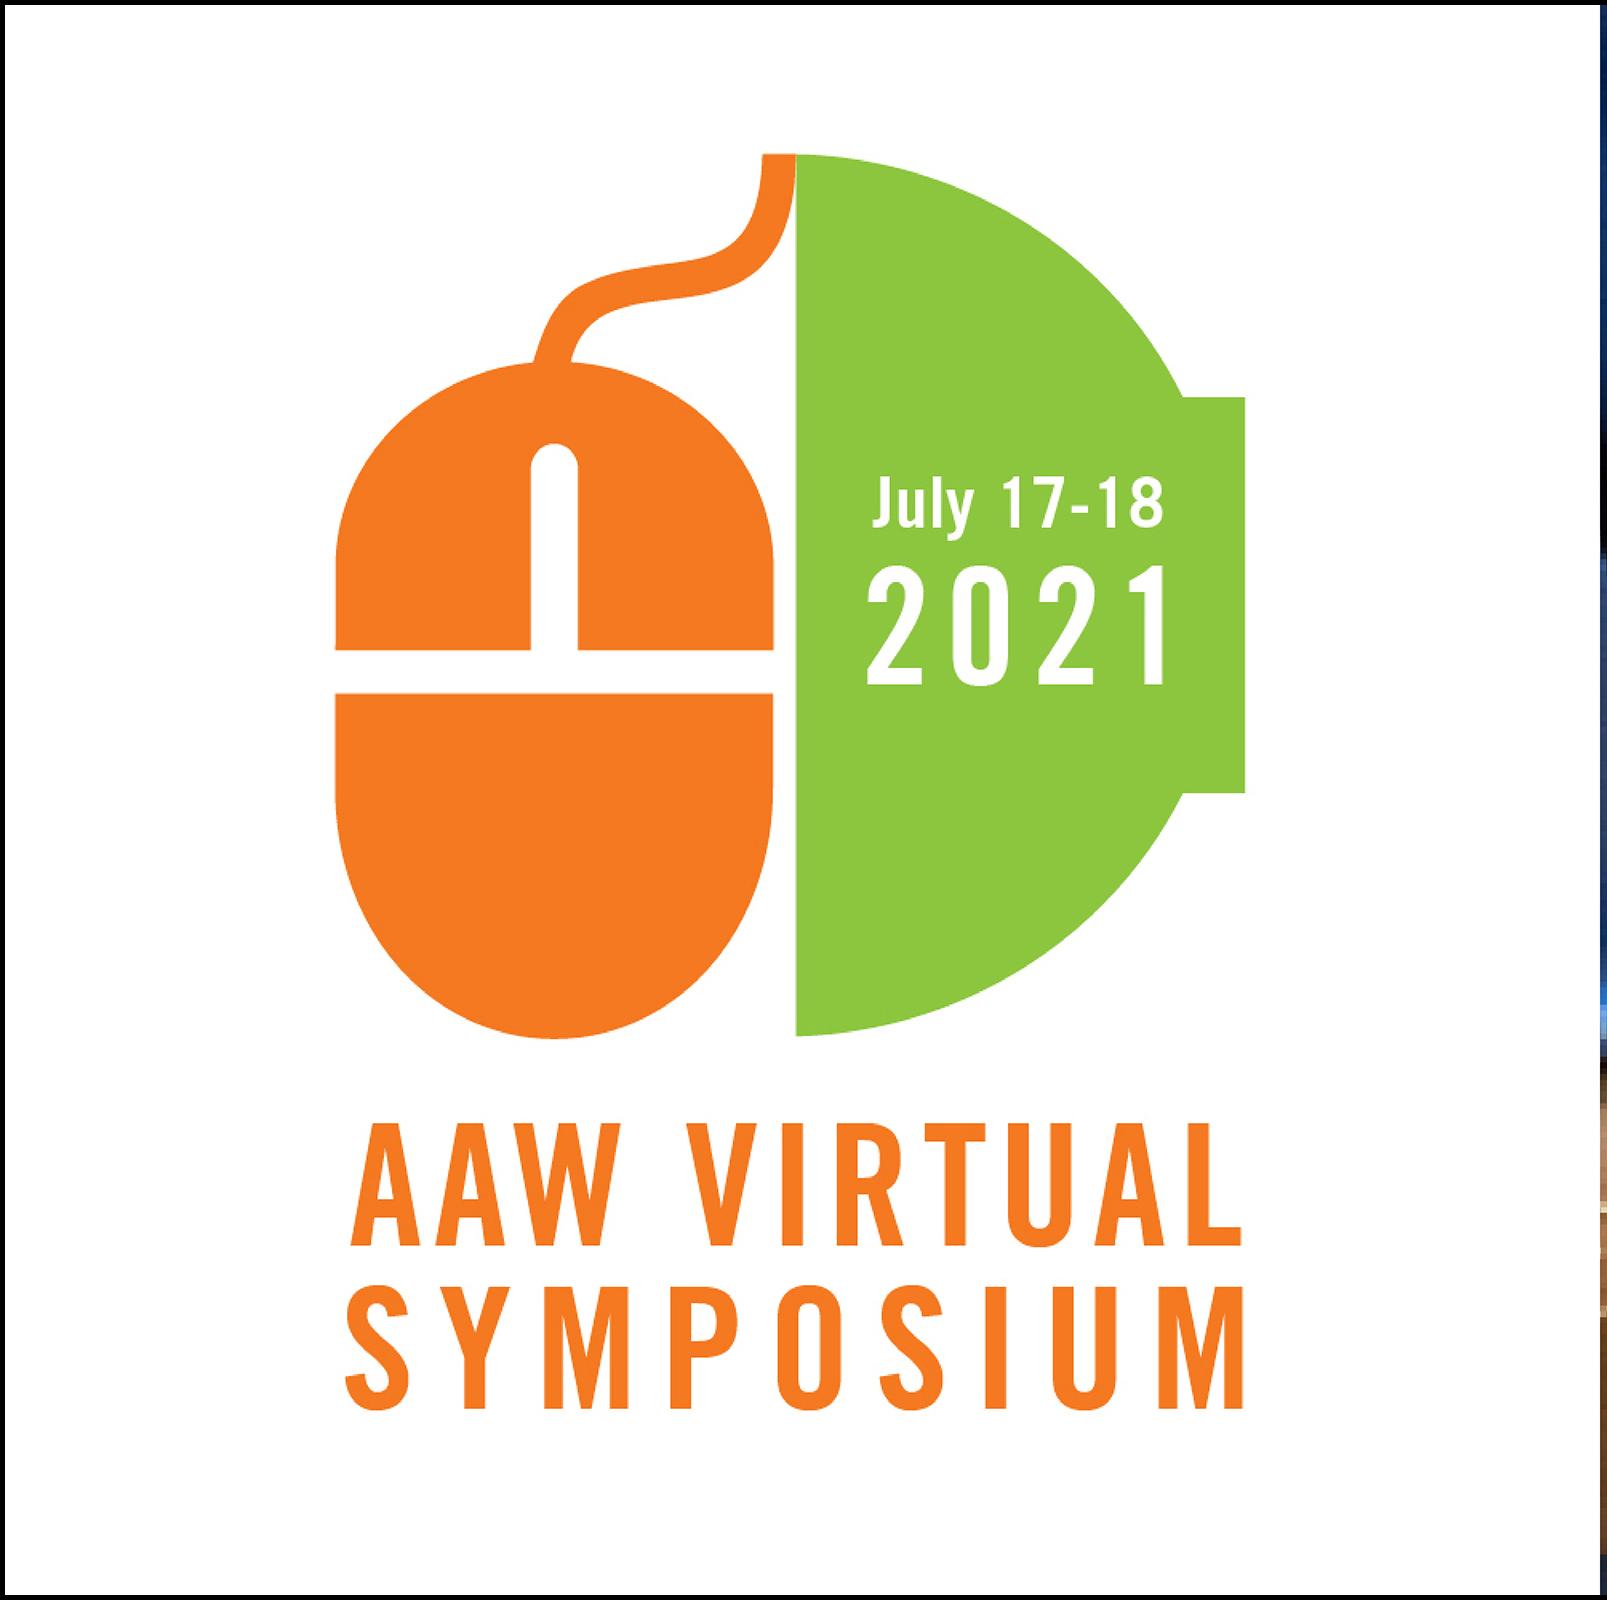 AAW symposium